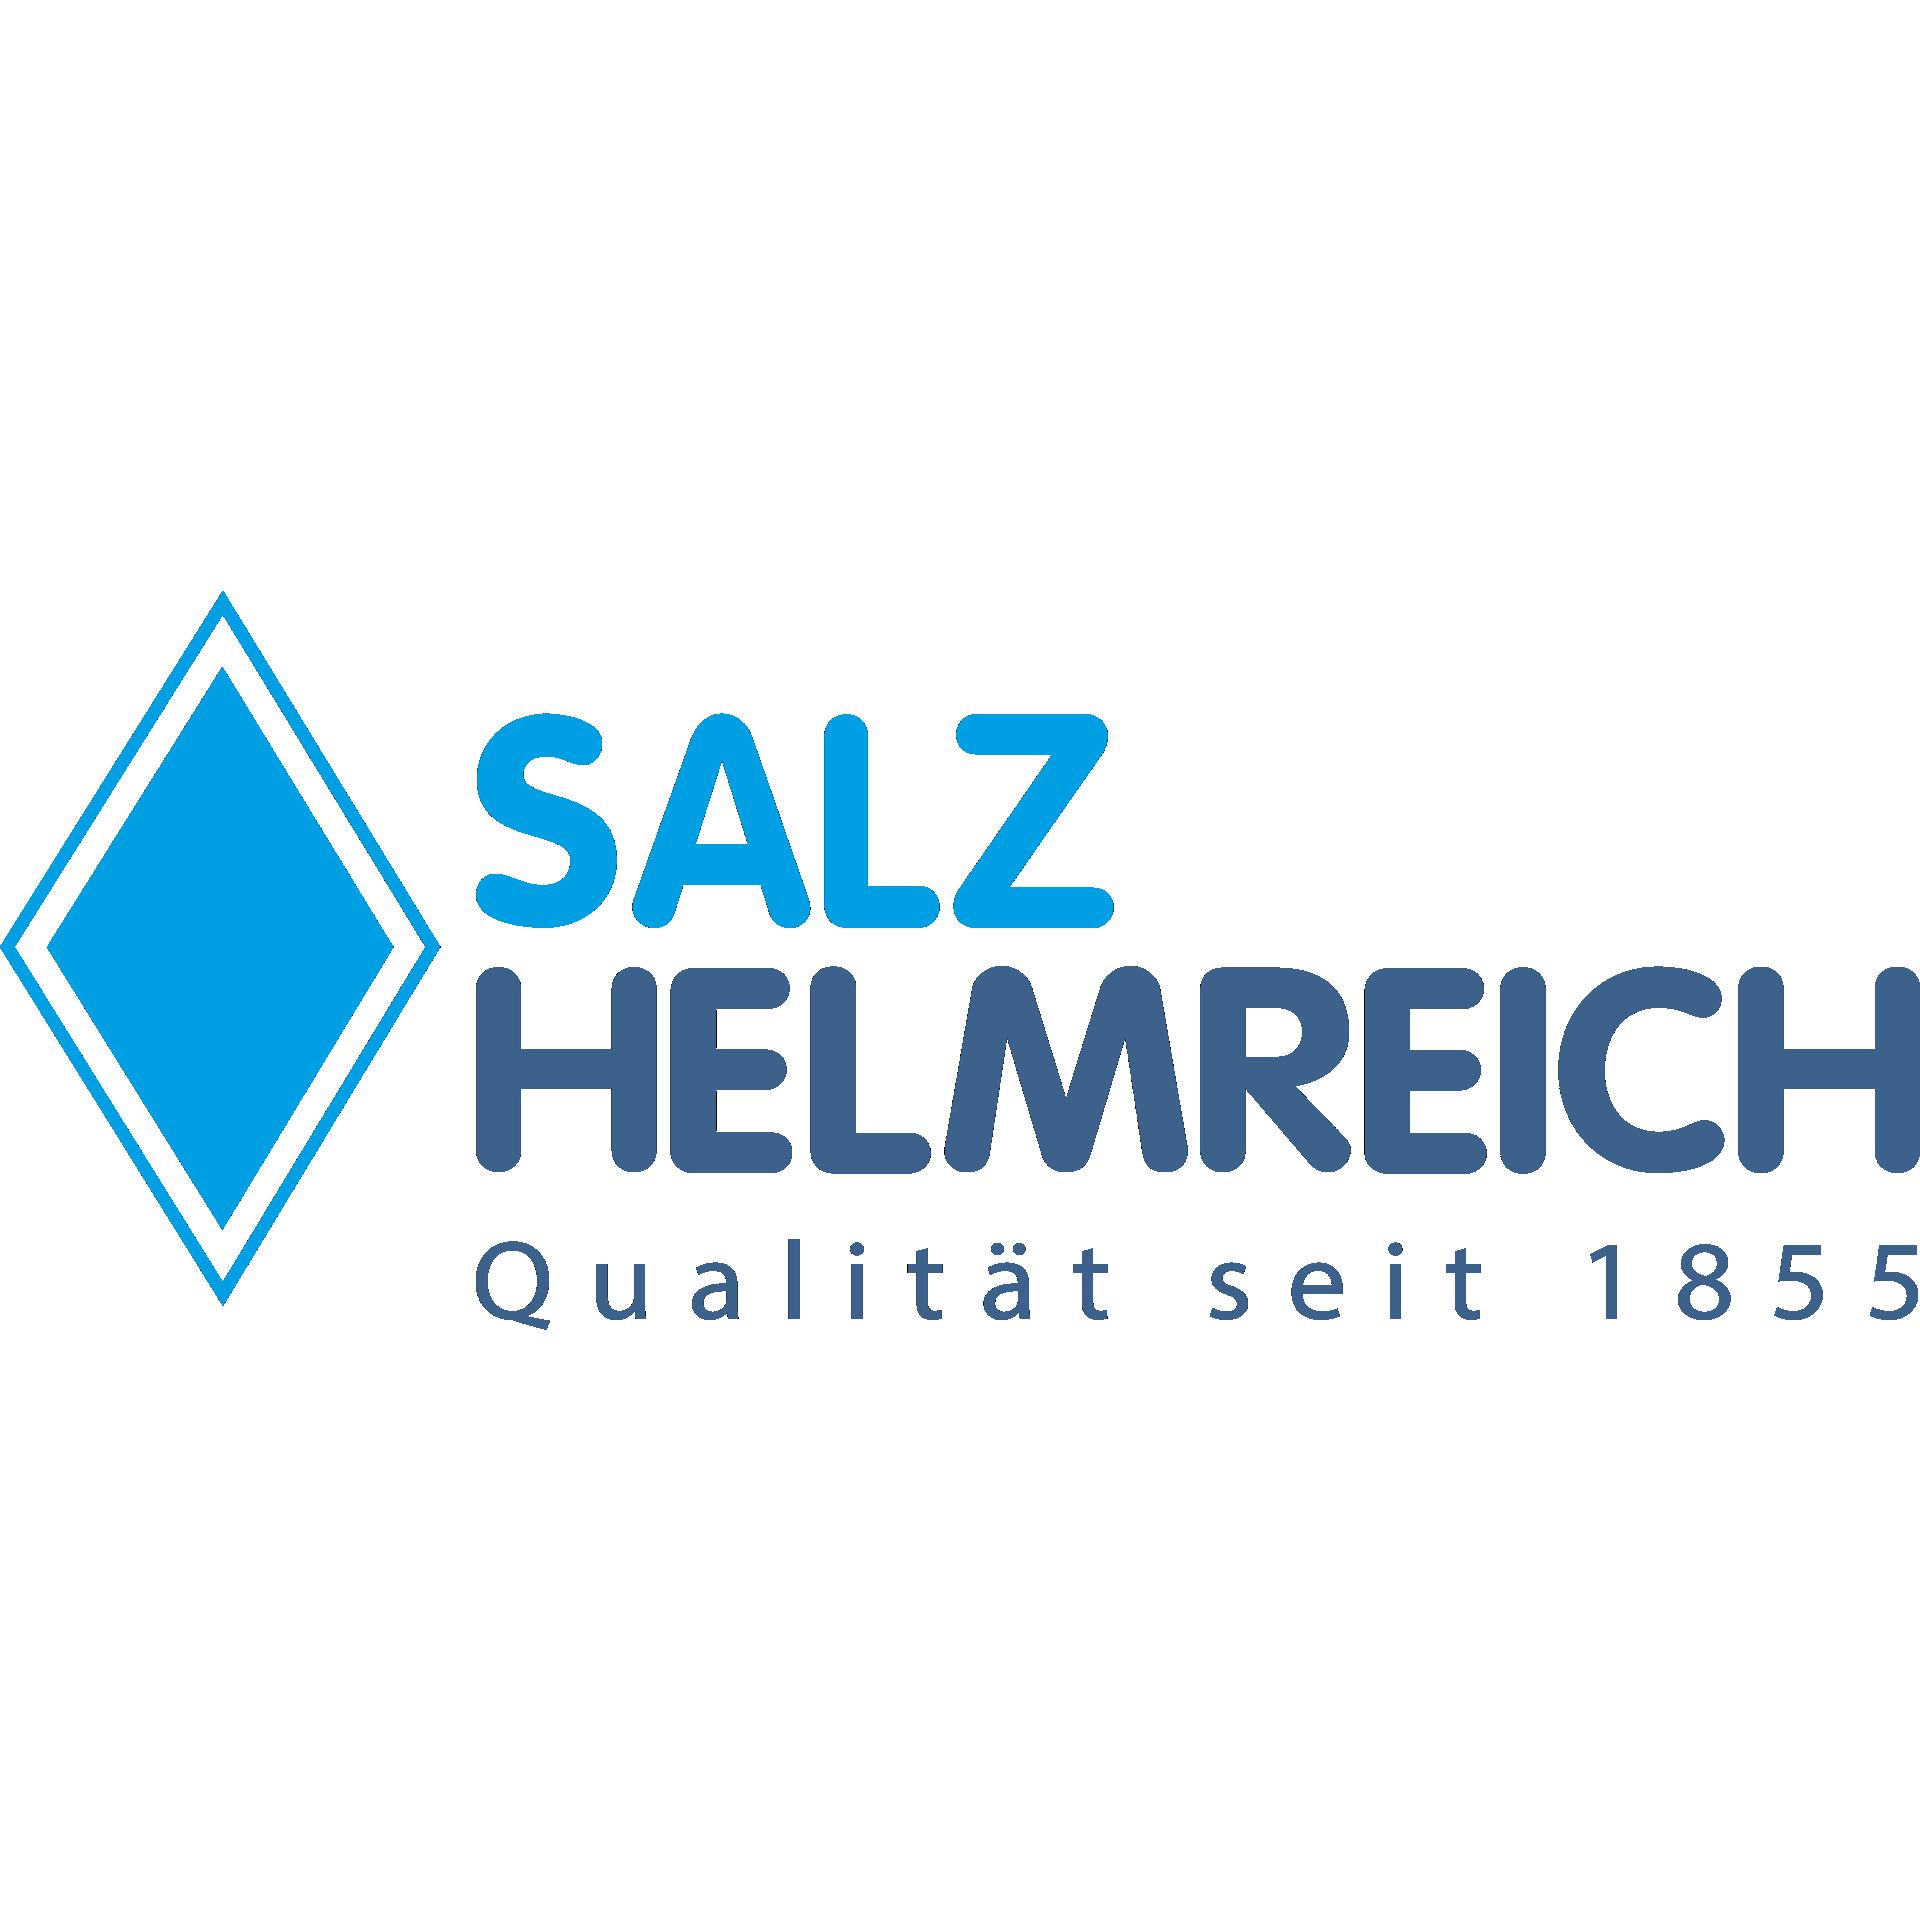 Calciumchlorid Dihydrat, E 509, Ph. Eur., USP im 25kg Sack